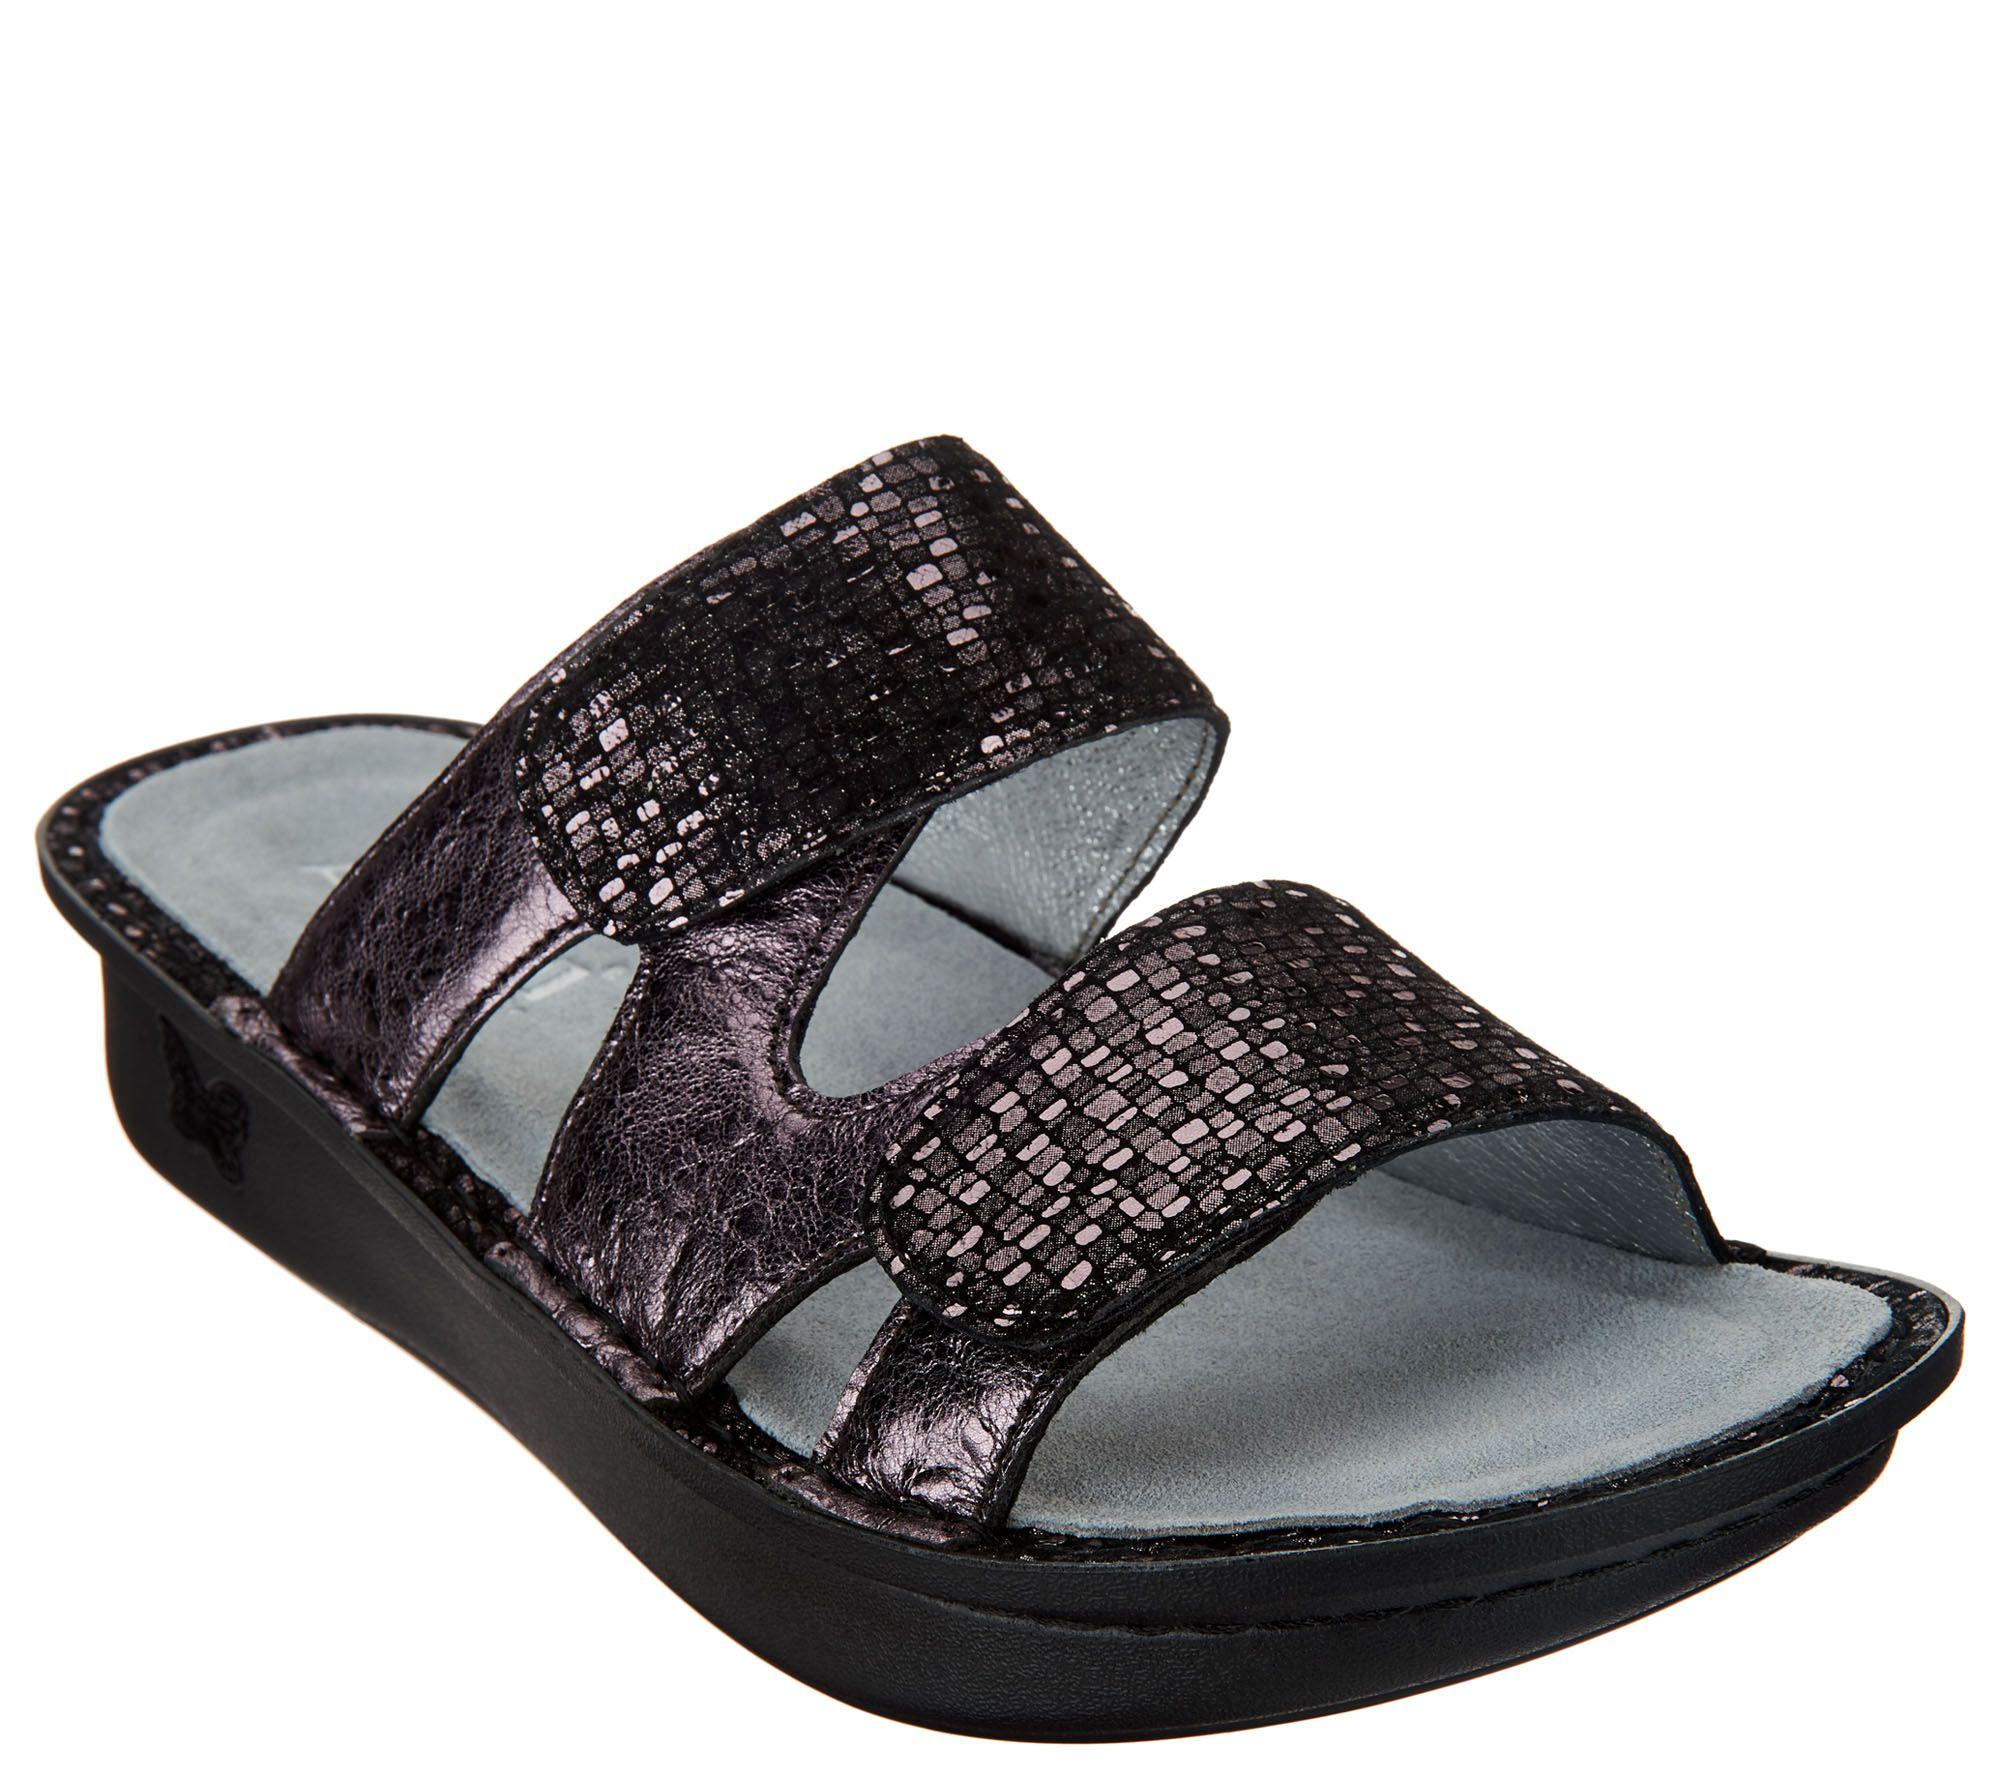 cfa72ca66abd Alegria Leather Adjustable Slide Sandals - Camille - Page 1 — QVC.com